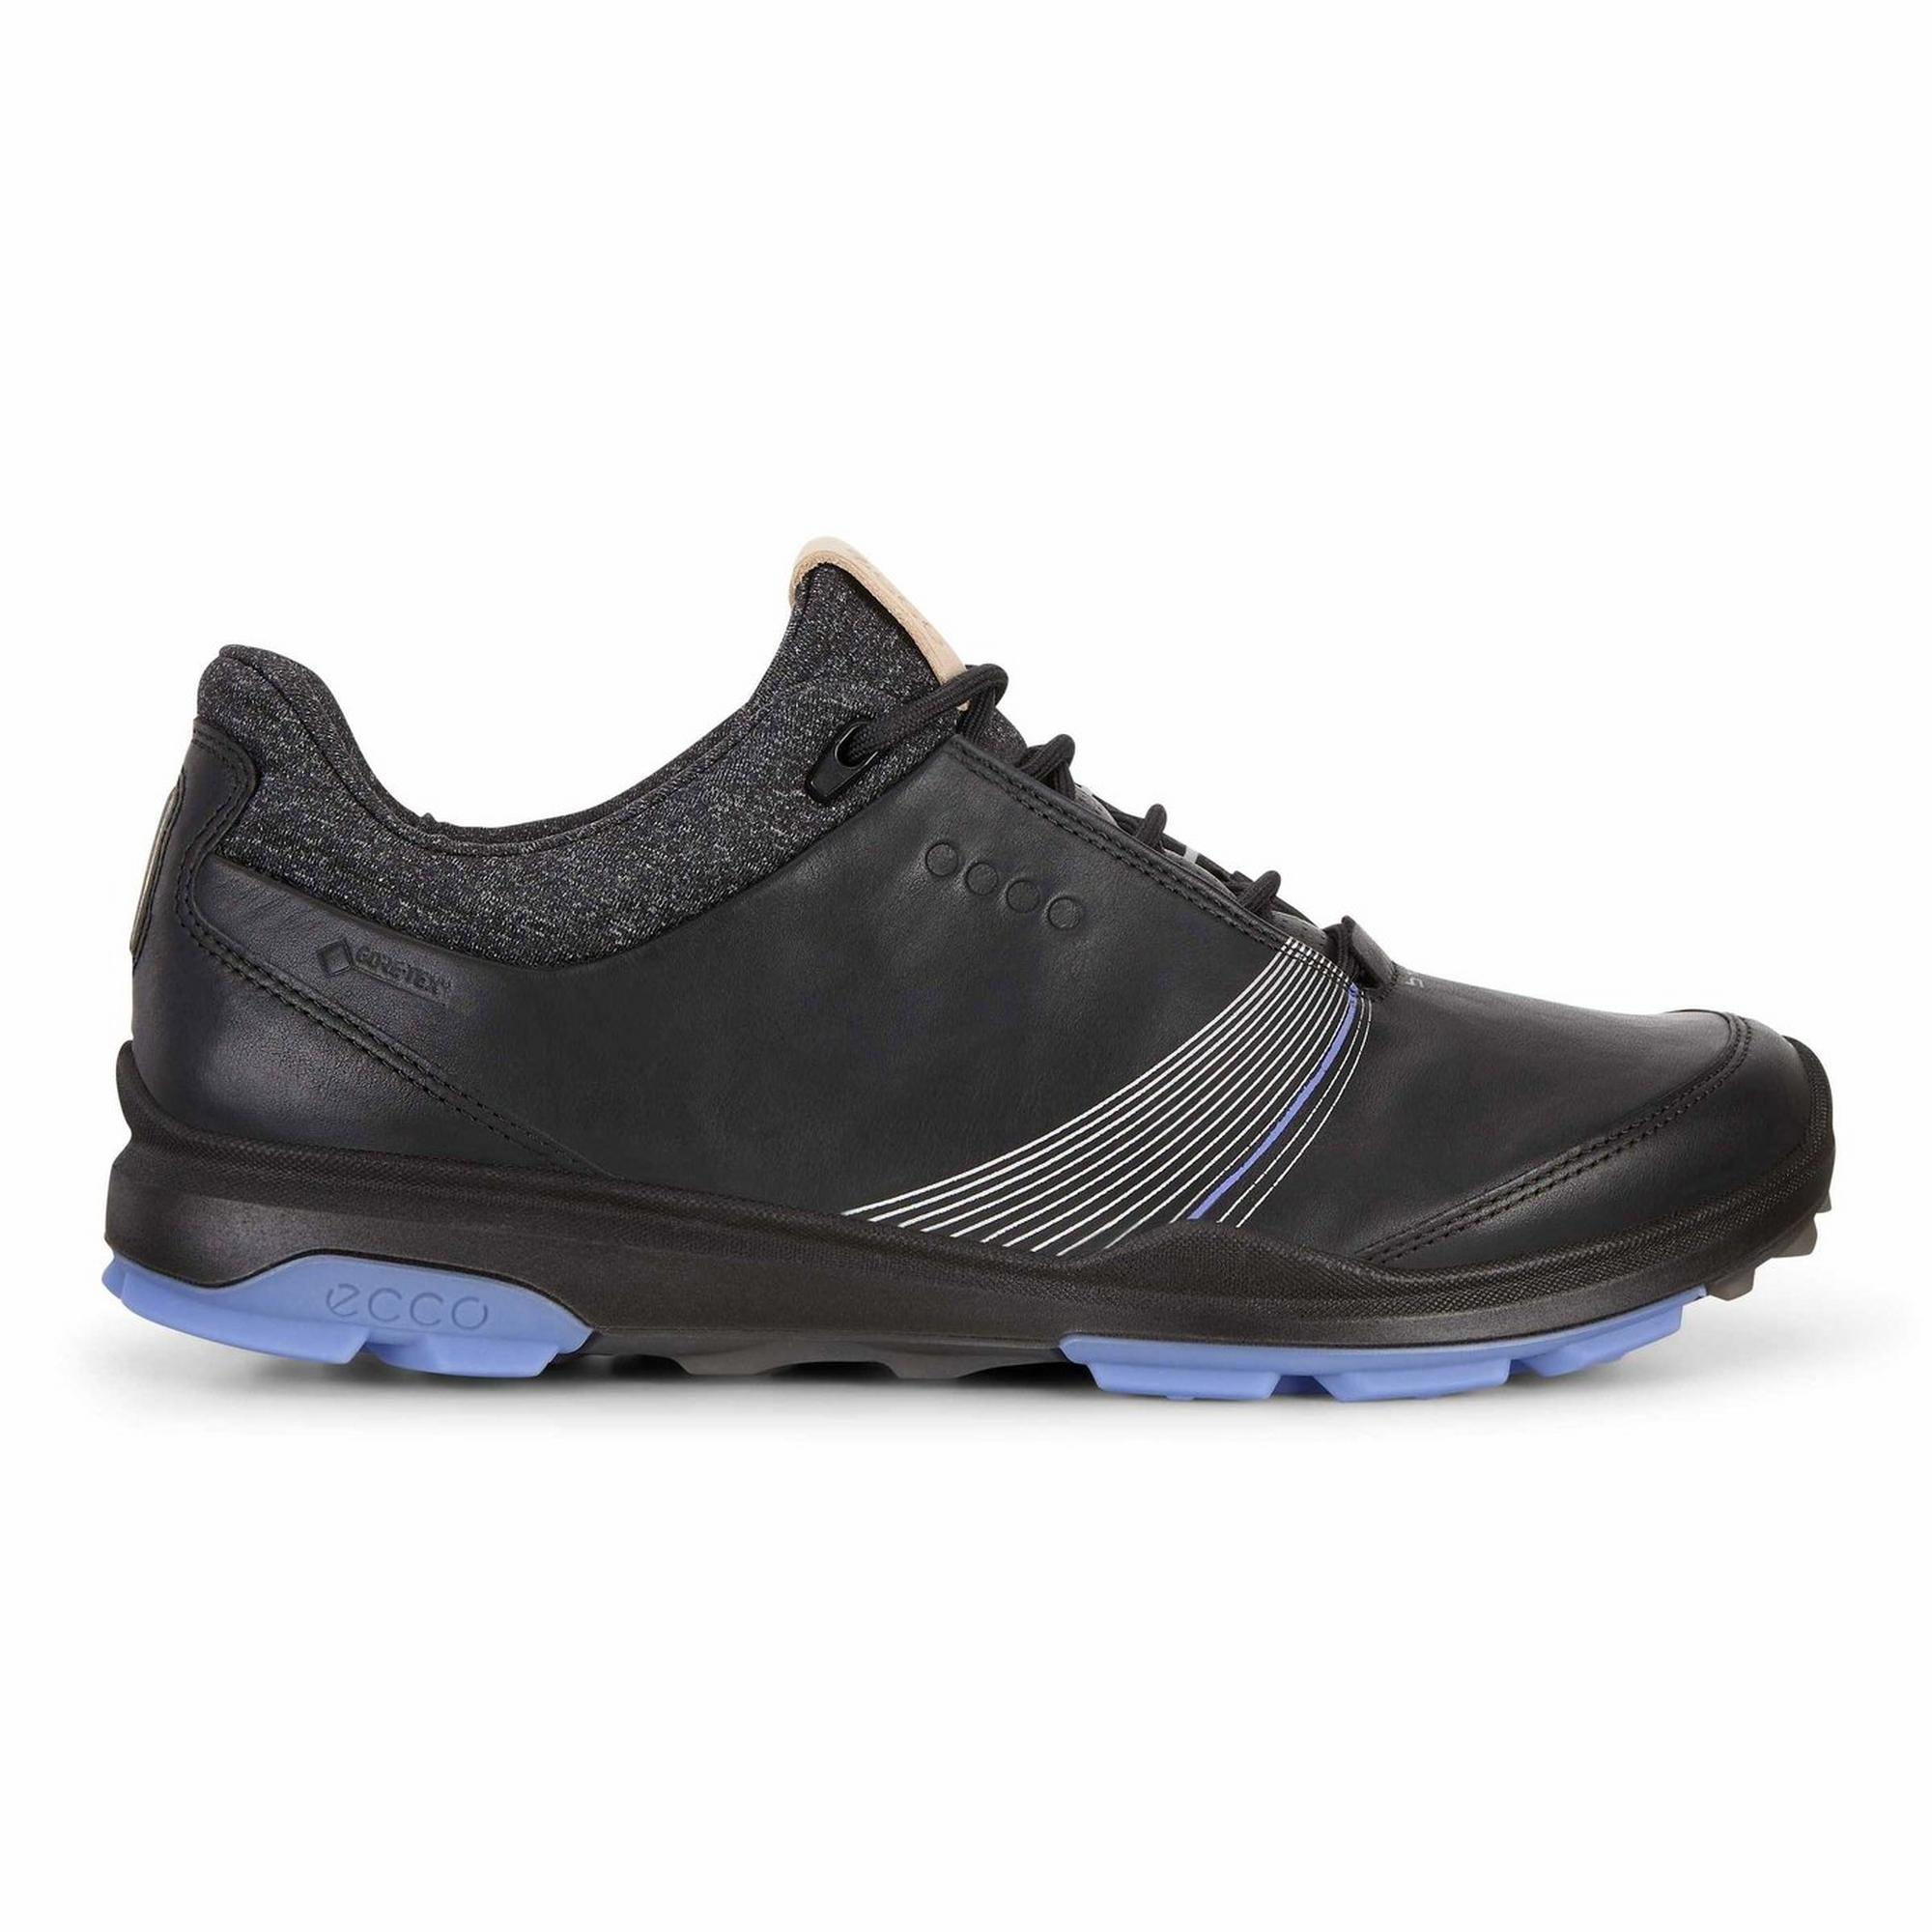 Women's Goretex Biom Hybrid 3 Spikeless Golf Shoe - BLACK/BLUE